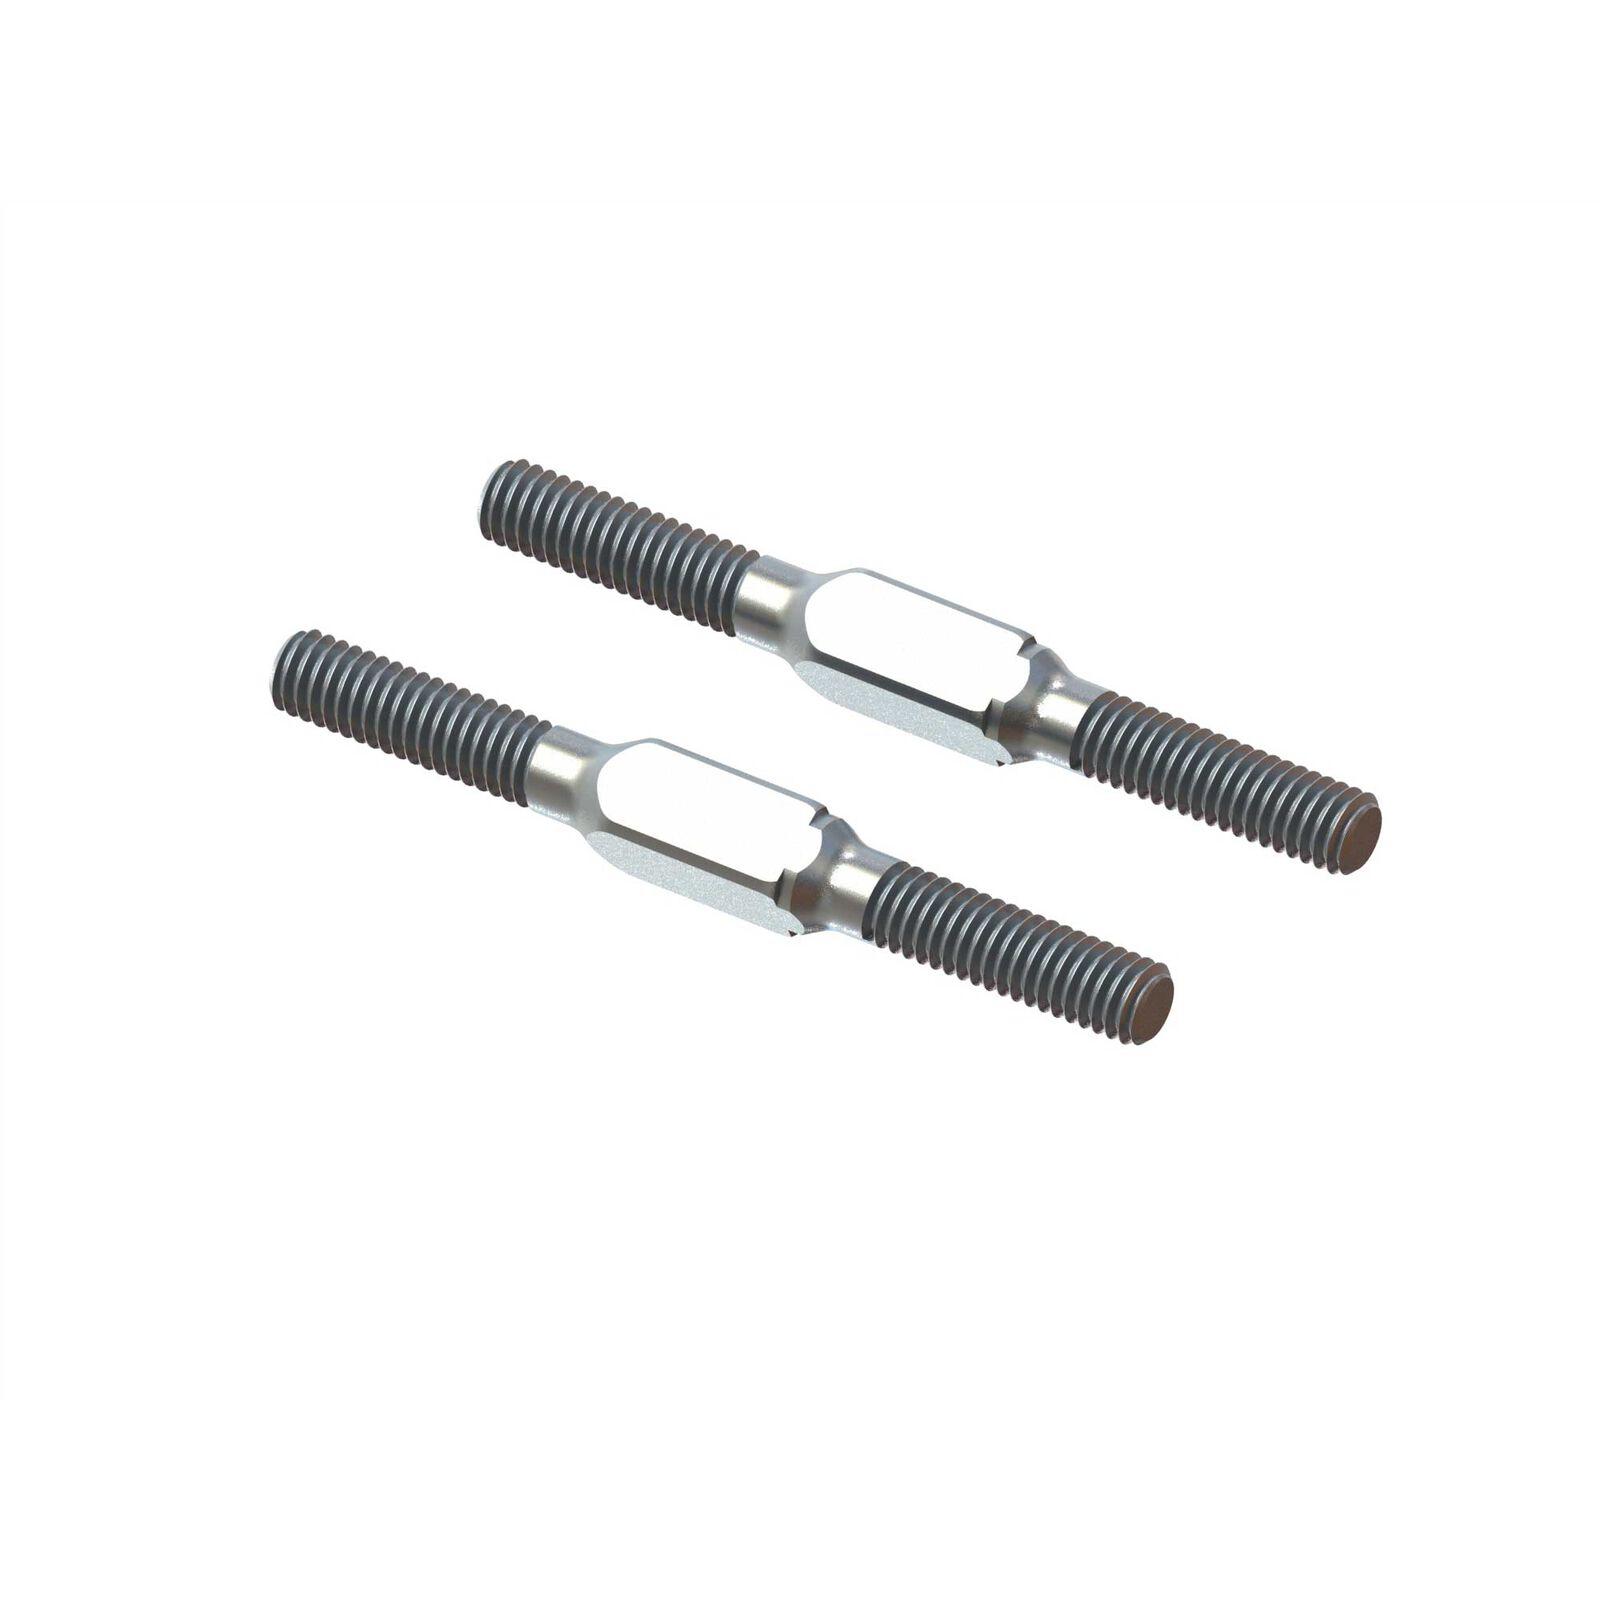 Steel Turnbuckle, M4x45mm Silver (2): EXB